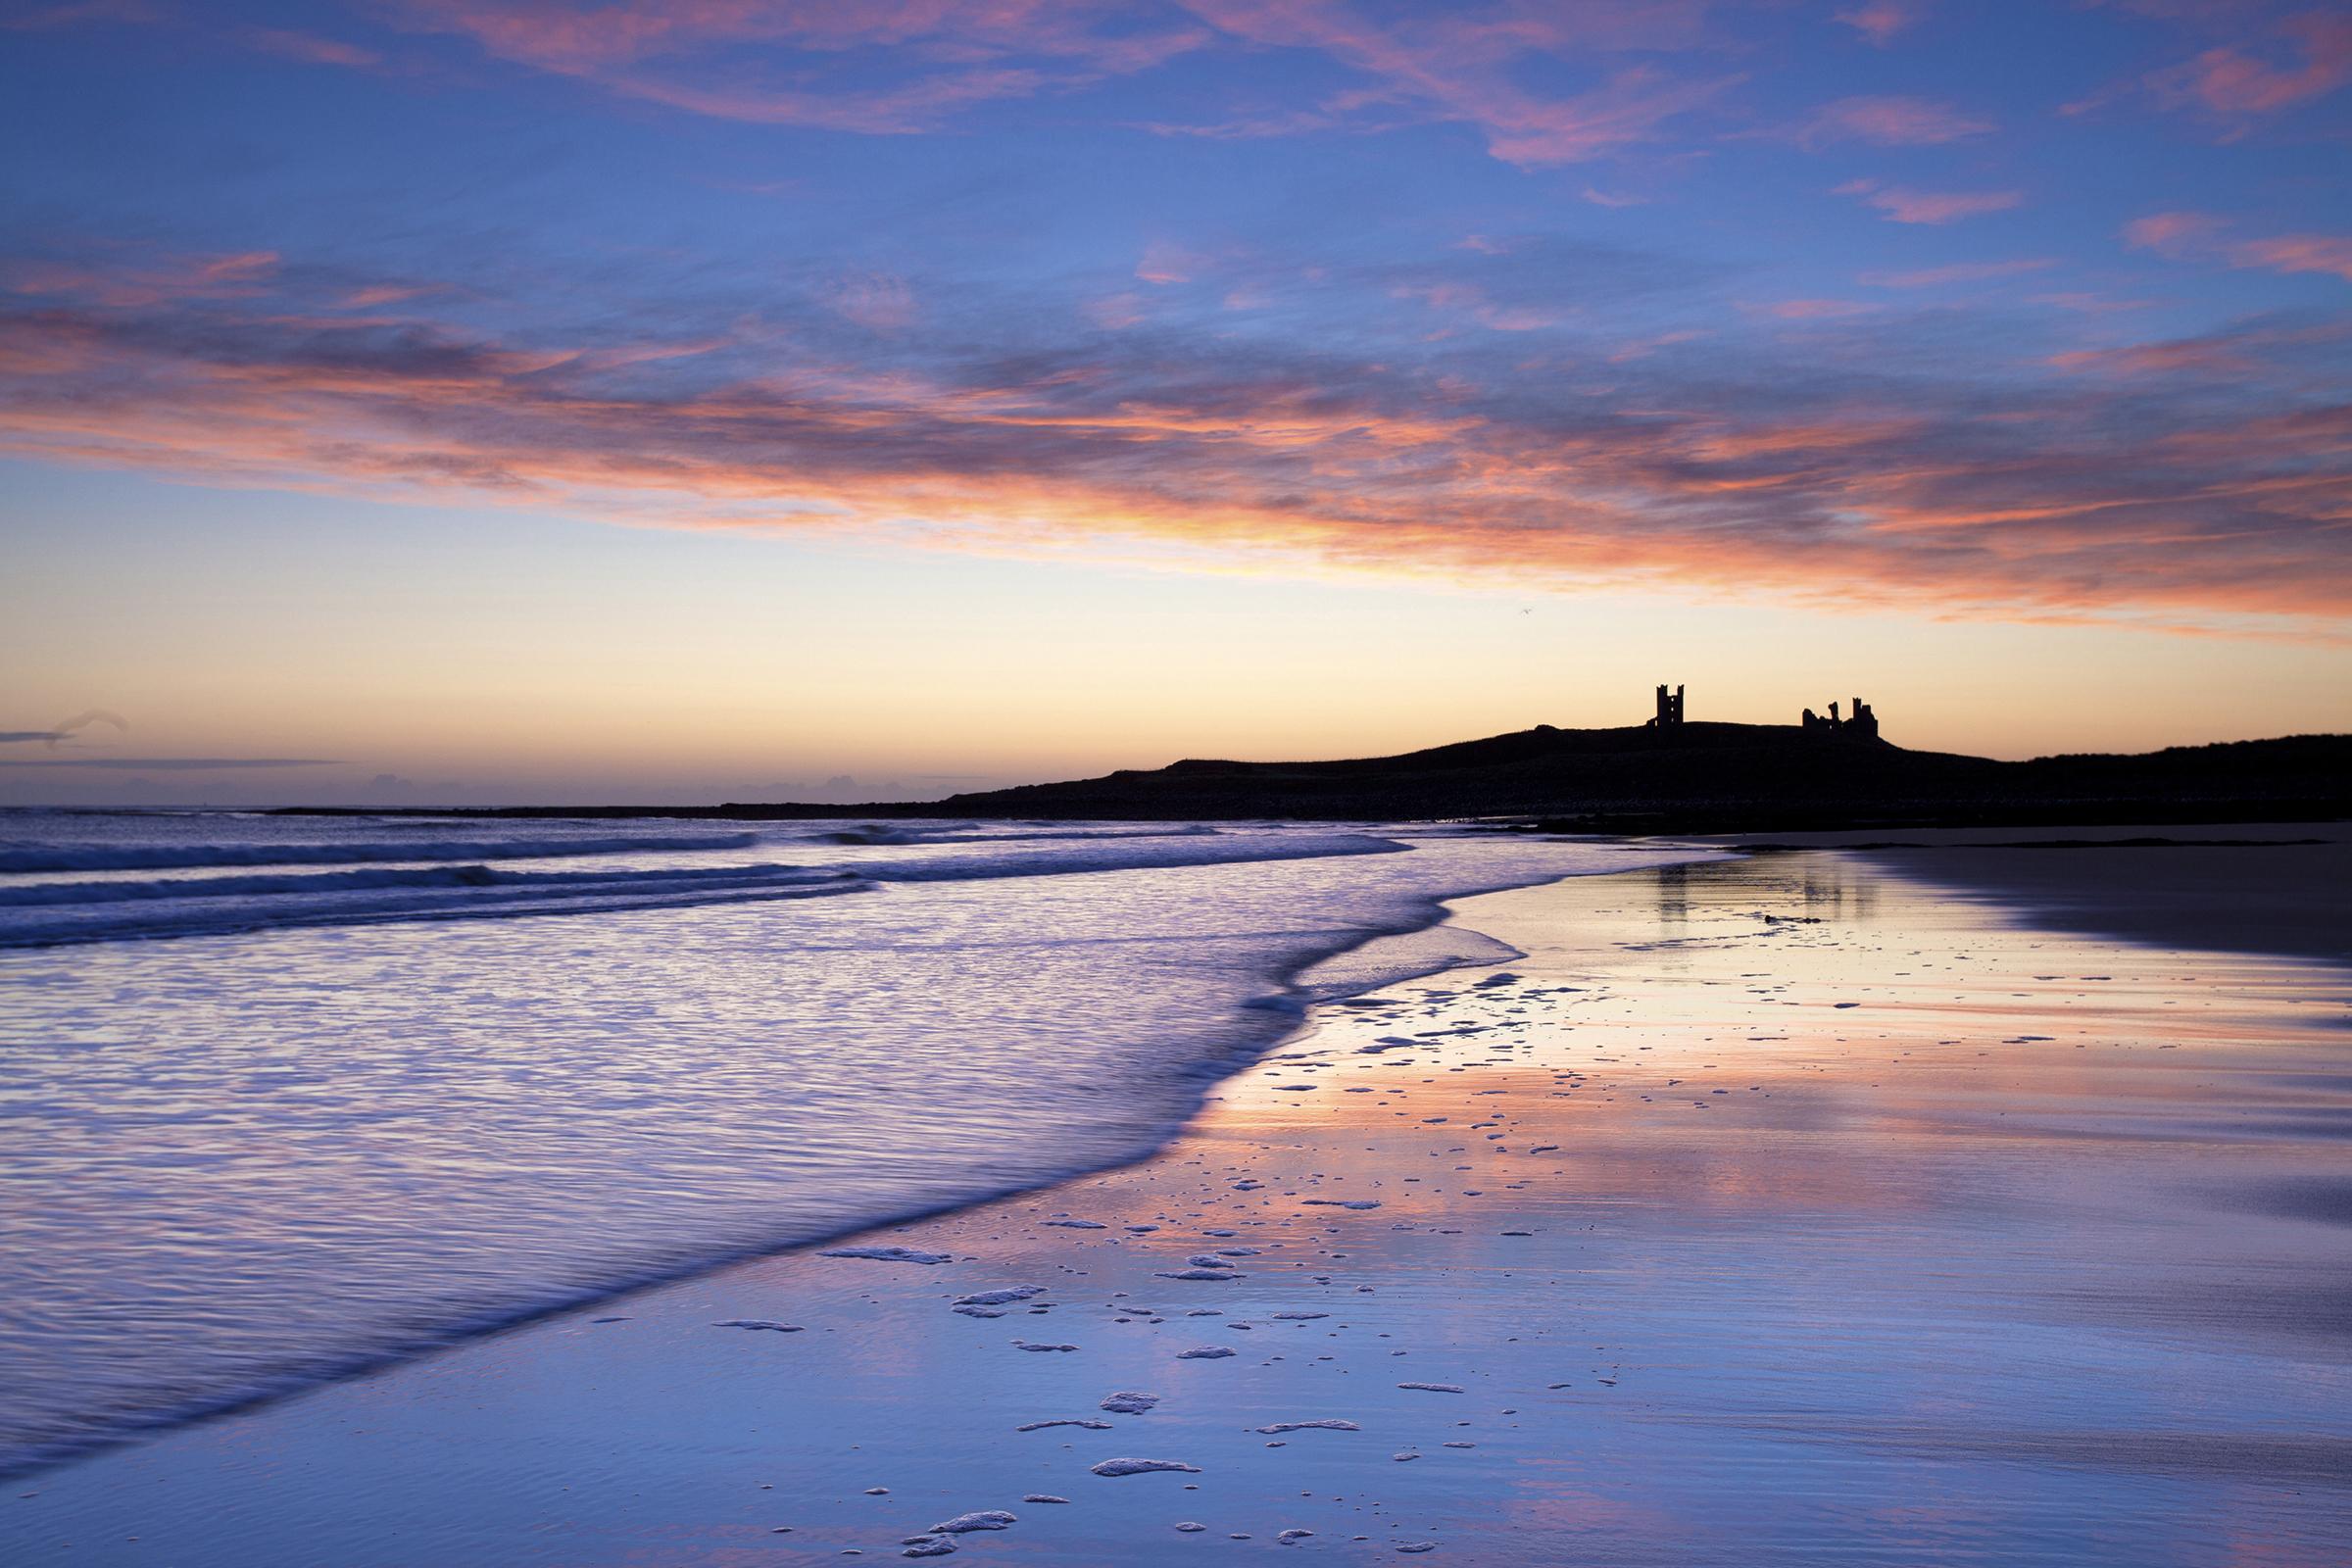 Lo mejor para amaneceresatardeceres Embleton Bay Northumberland Reino Unido